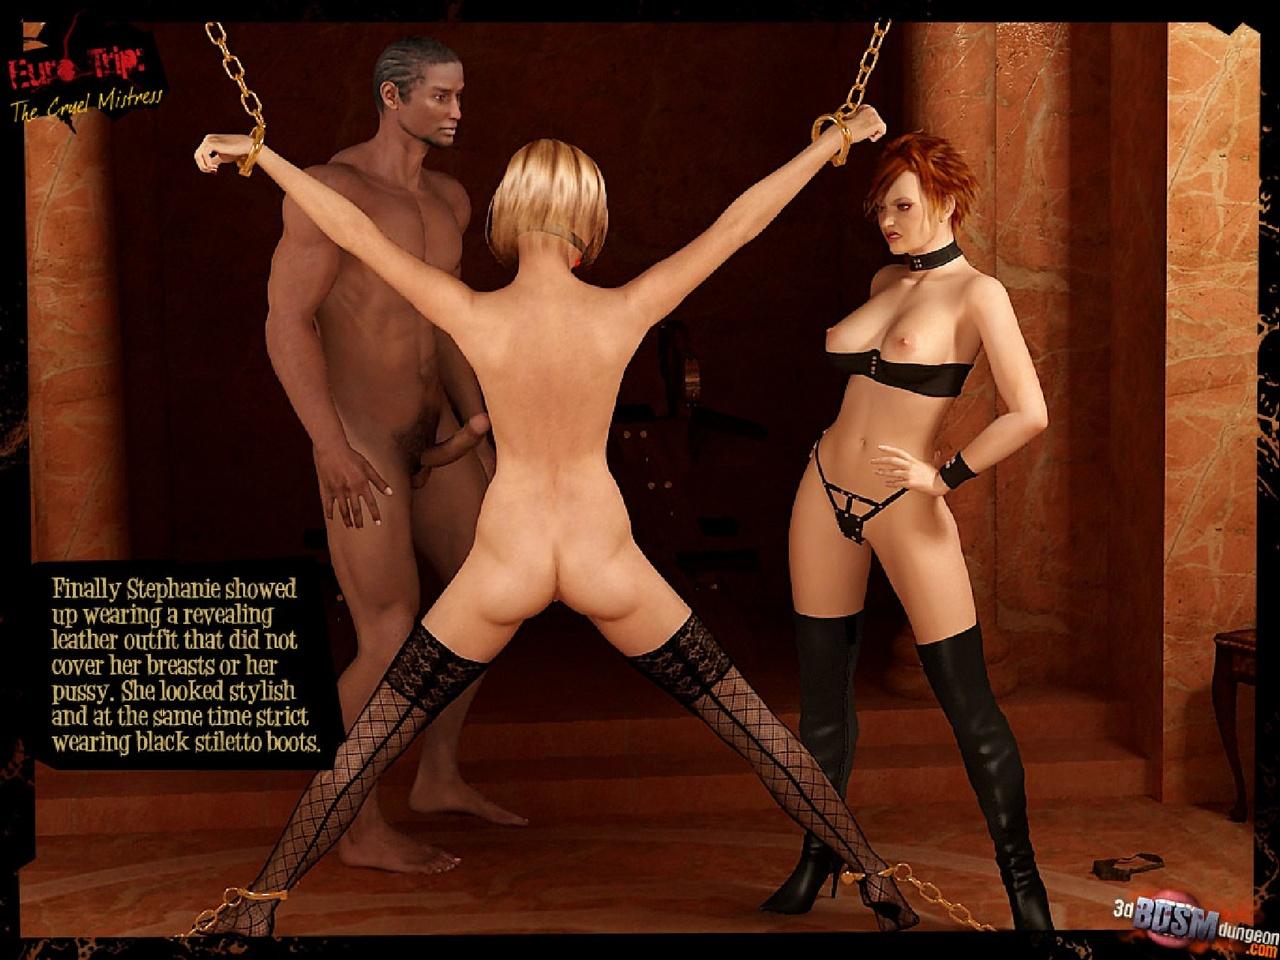 Euro Trip 3 - The Cruel Mistress - part 2